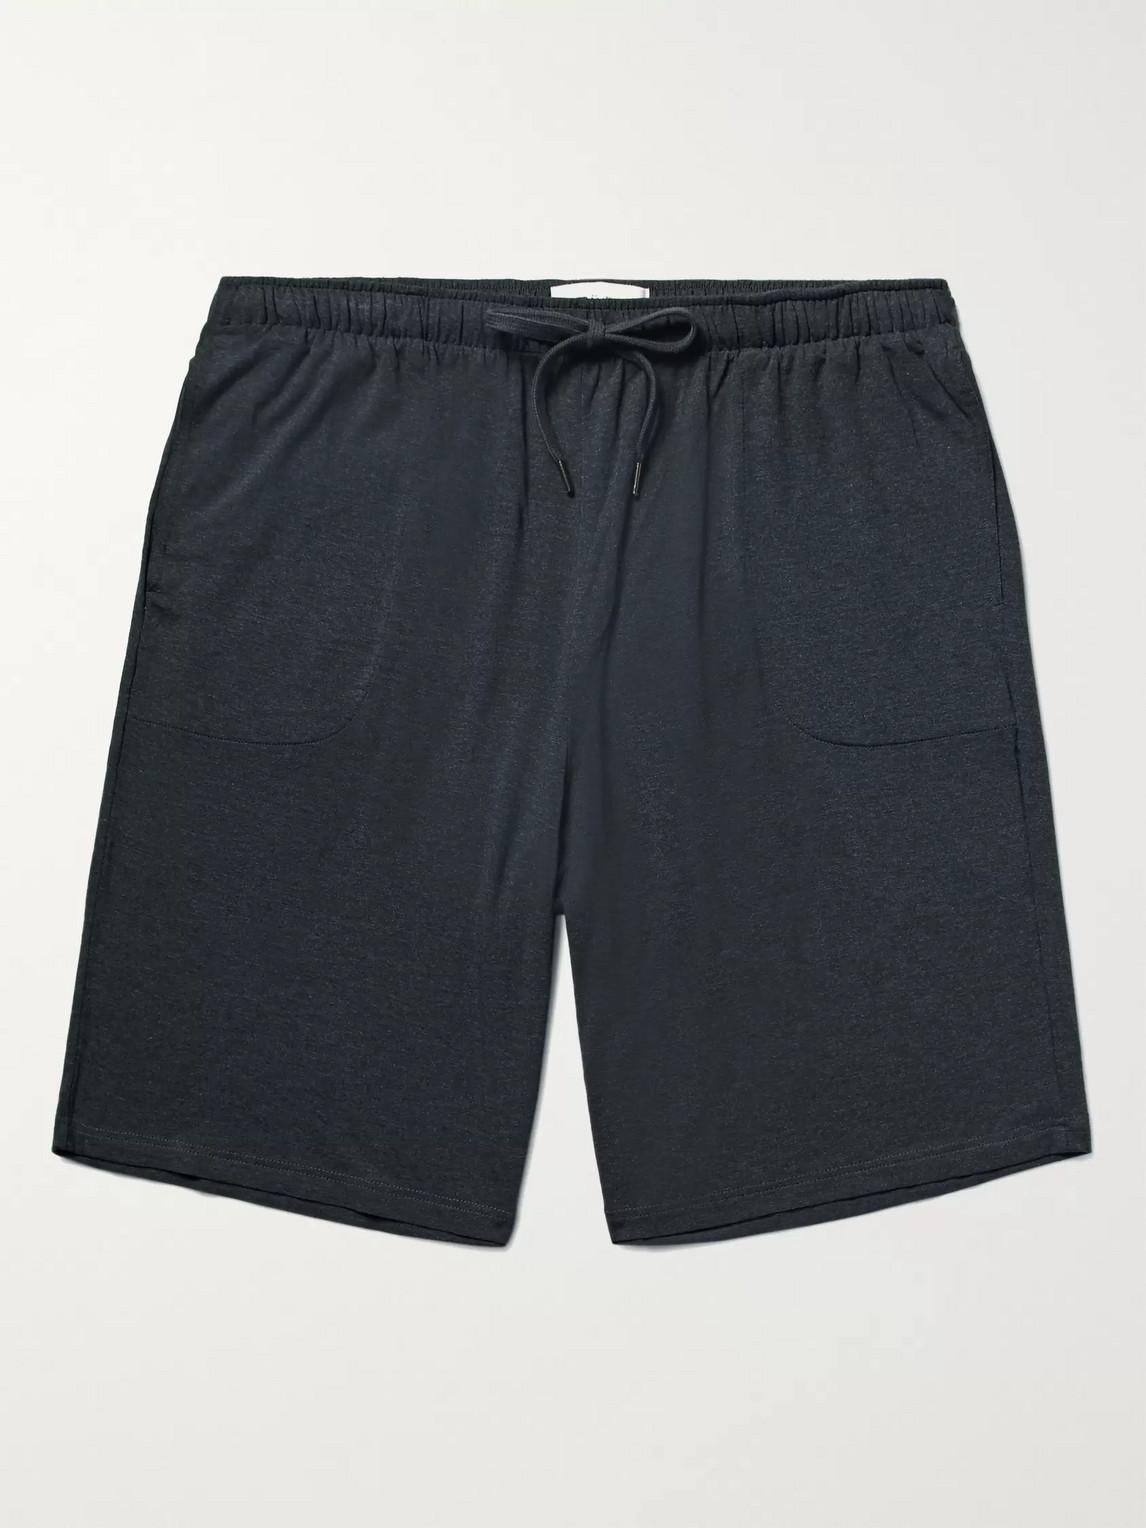 derek rose - marlowe stretch micro modal jersey pyjama shorts - gray - s - men